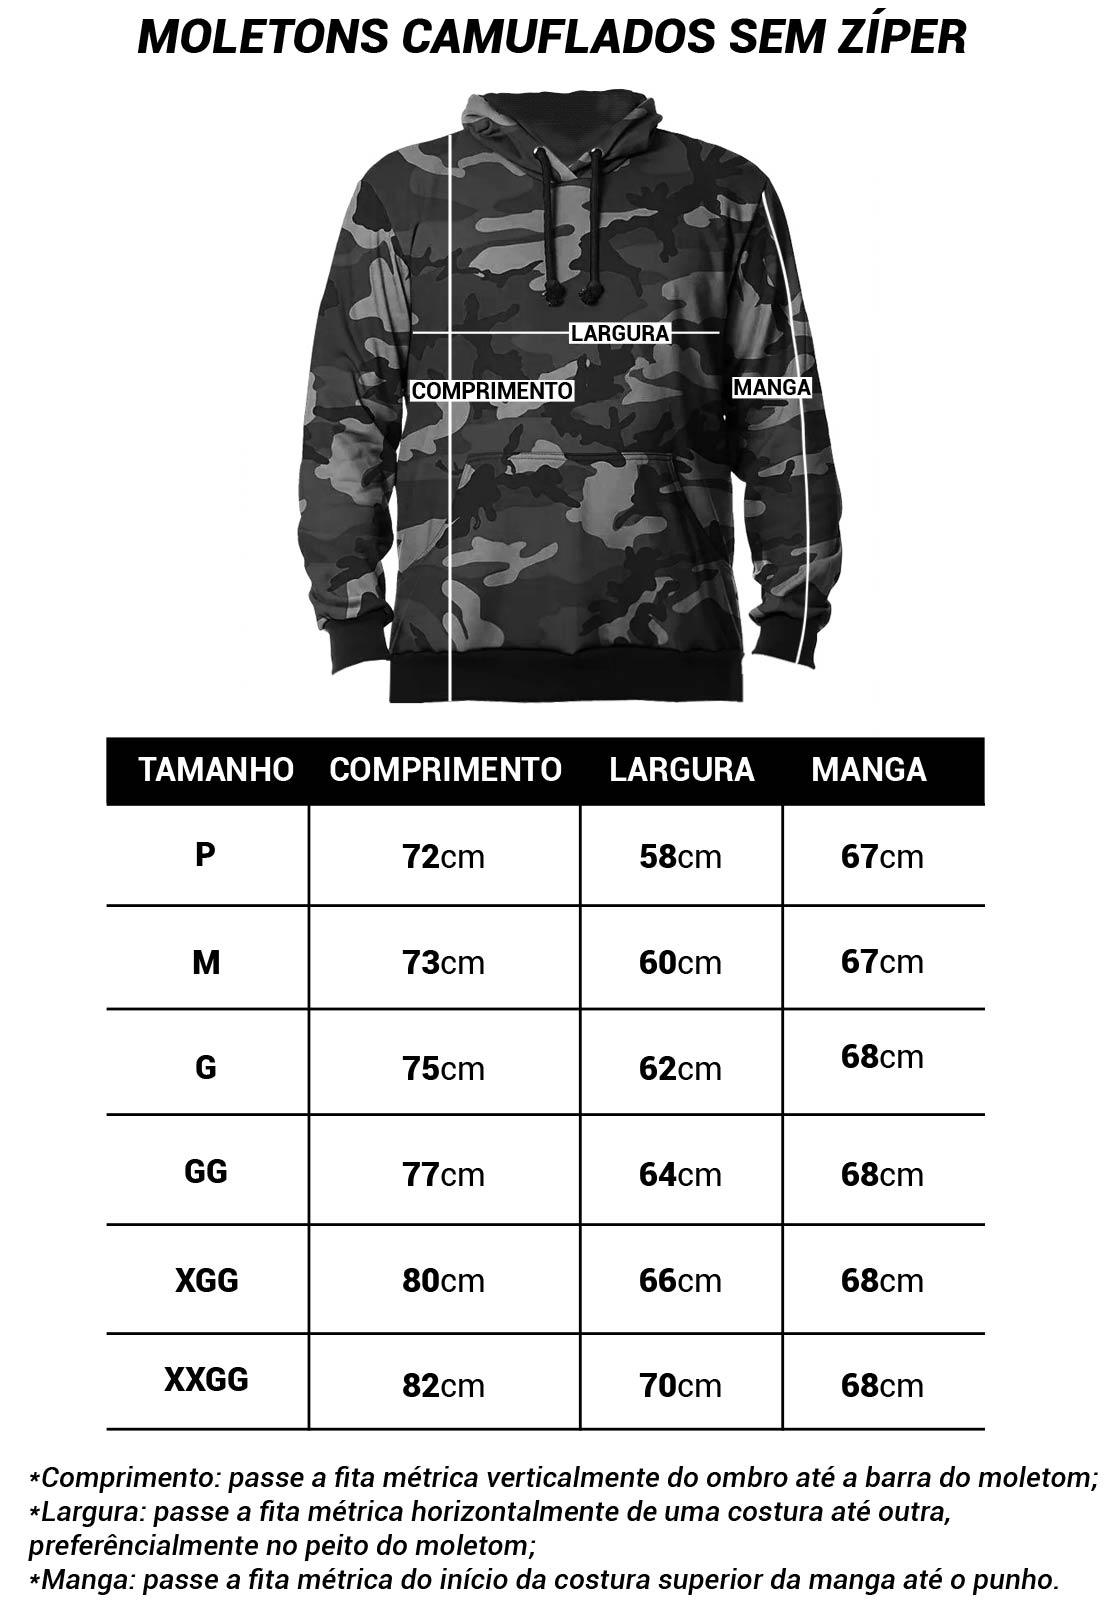 MOLETOM CAMUFLADO URBANO BLACK MASCULINO FECHADO  - REAL HUNTER OUTDOORS